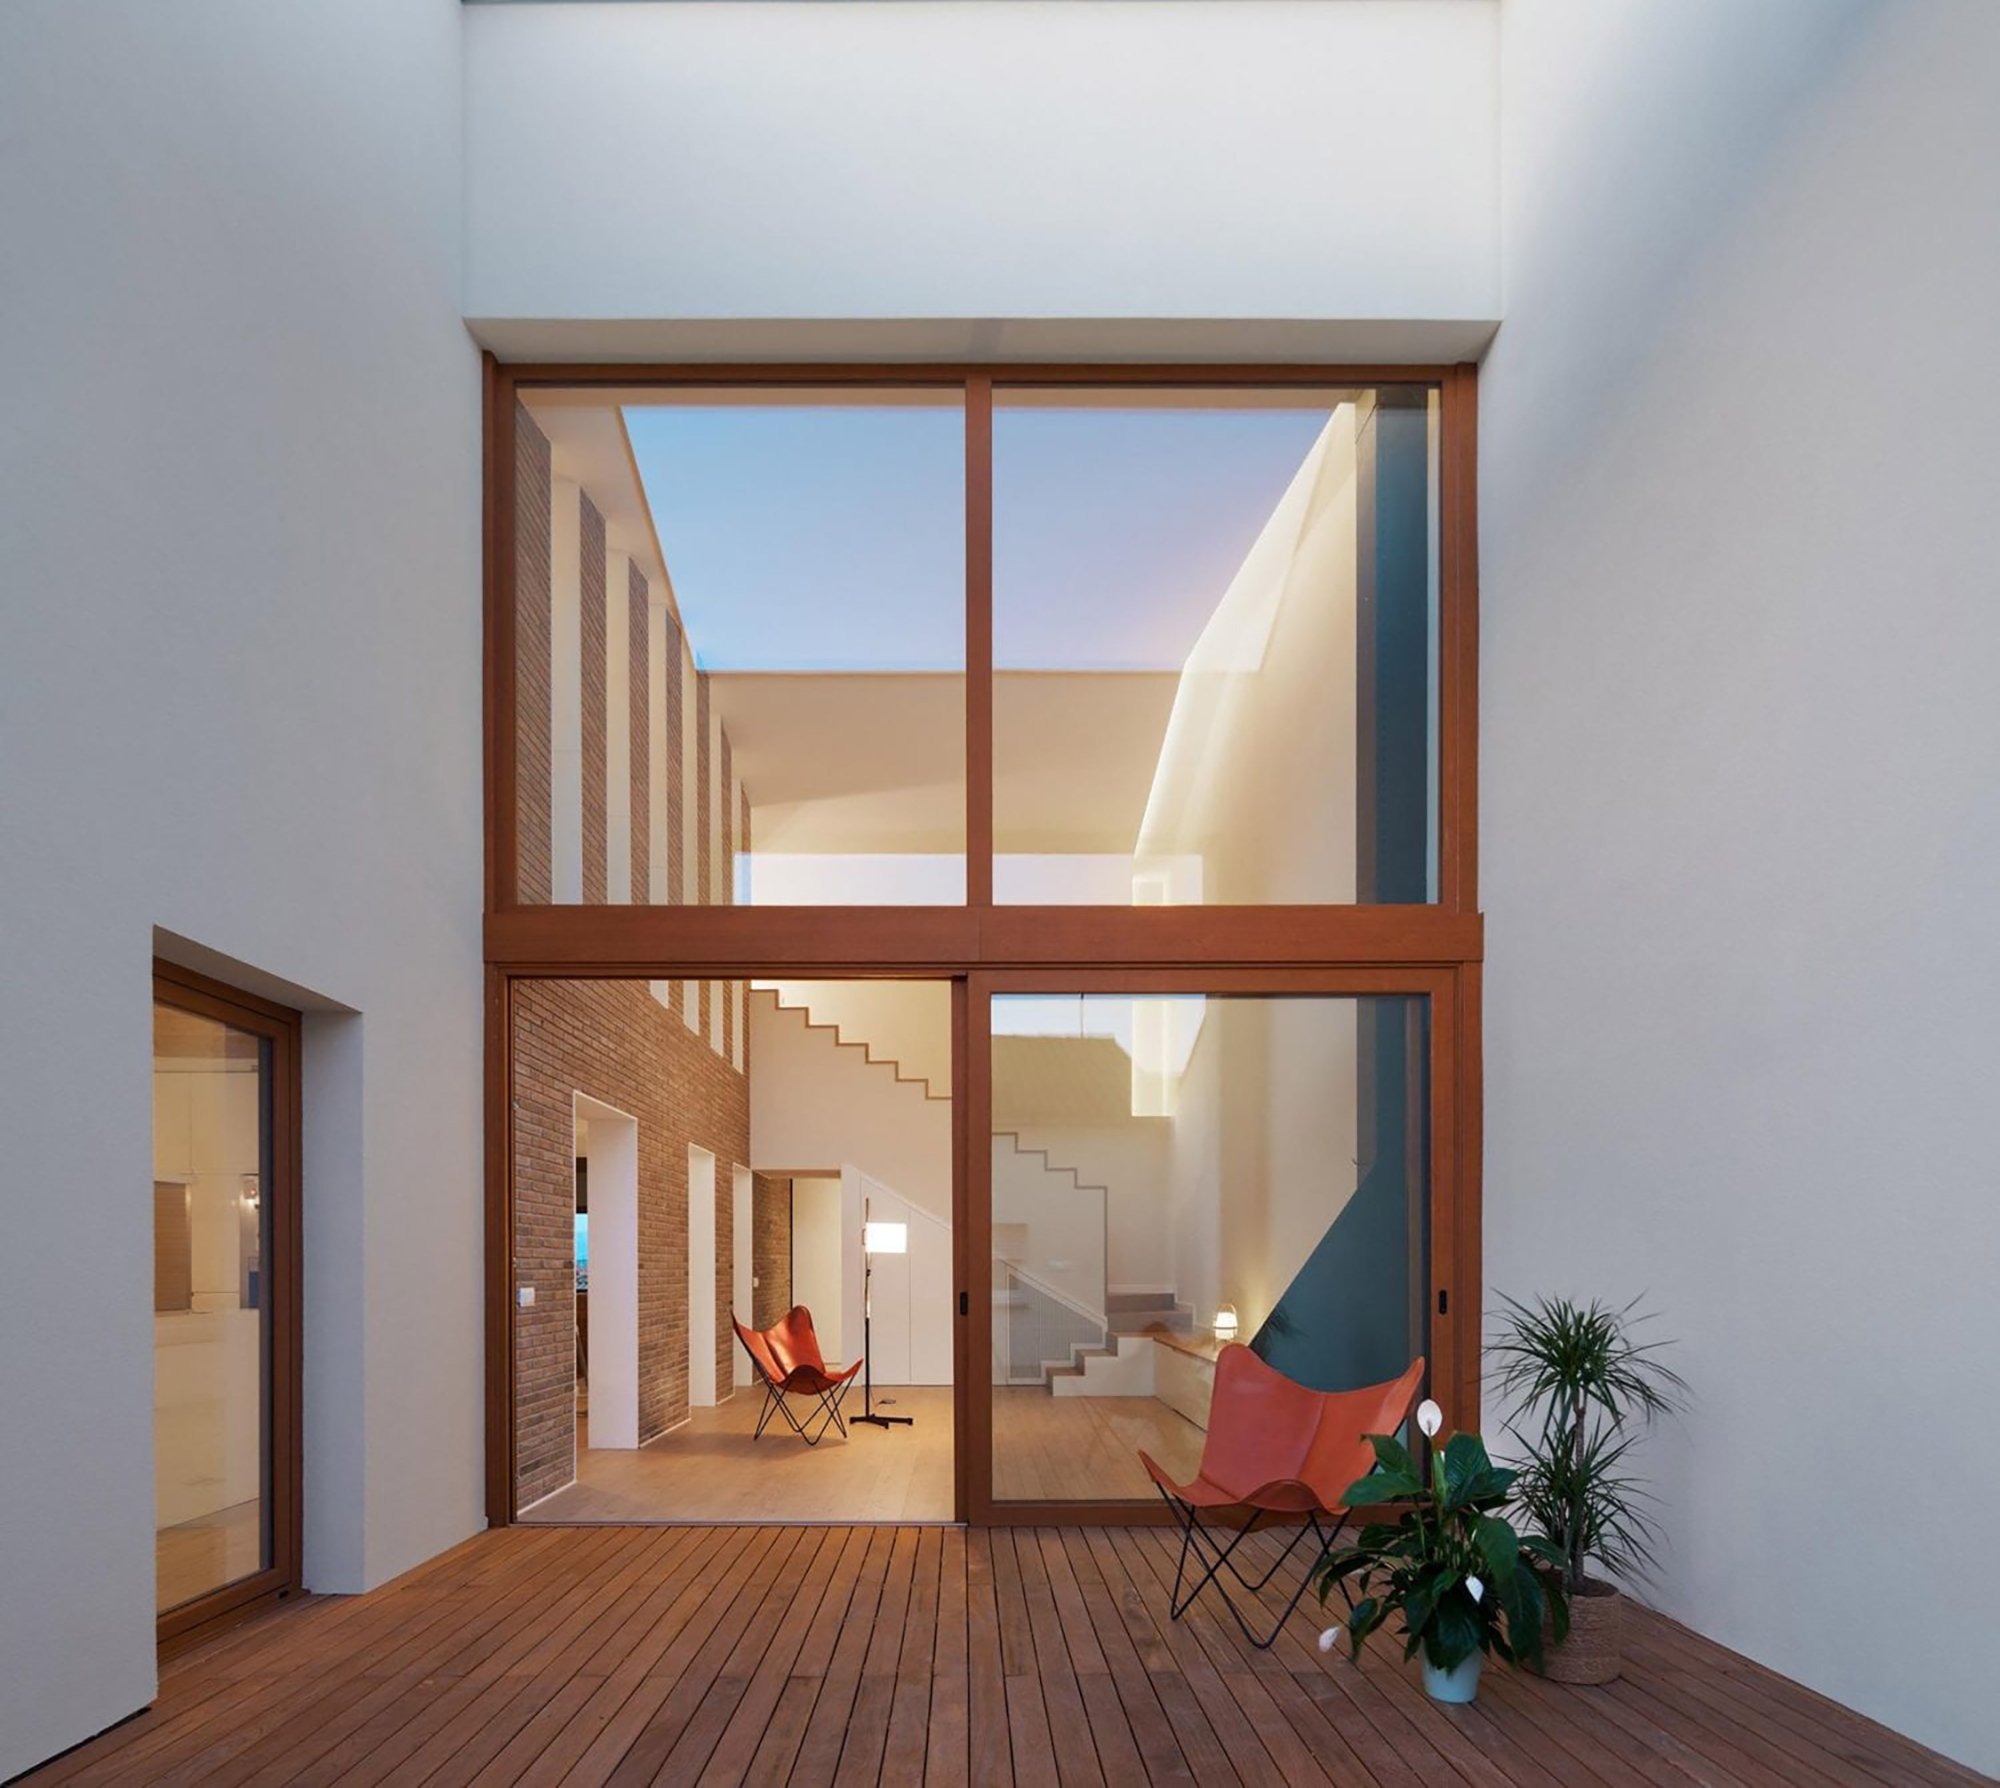 Spain, Sunday, Sanctuary, Interiors, Renovation, Stone, High ceilings